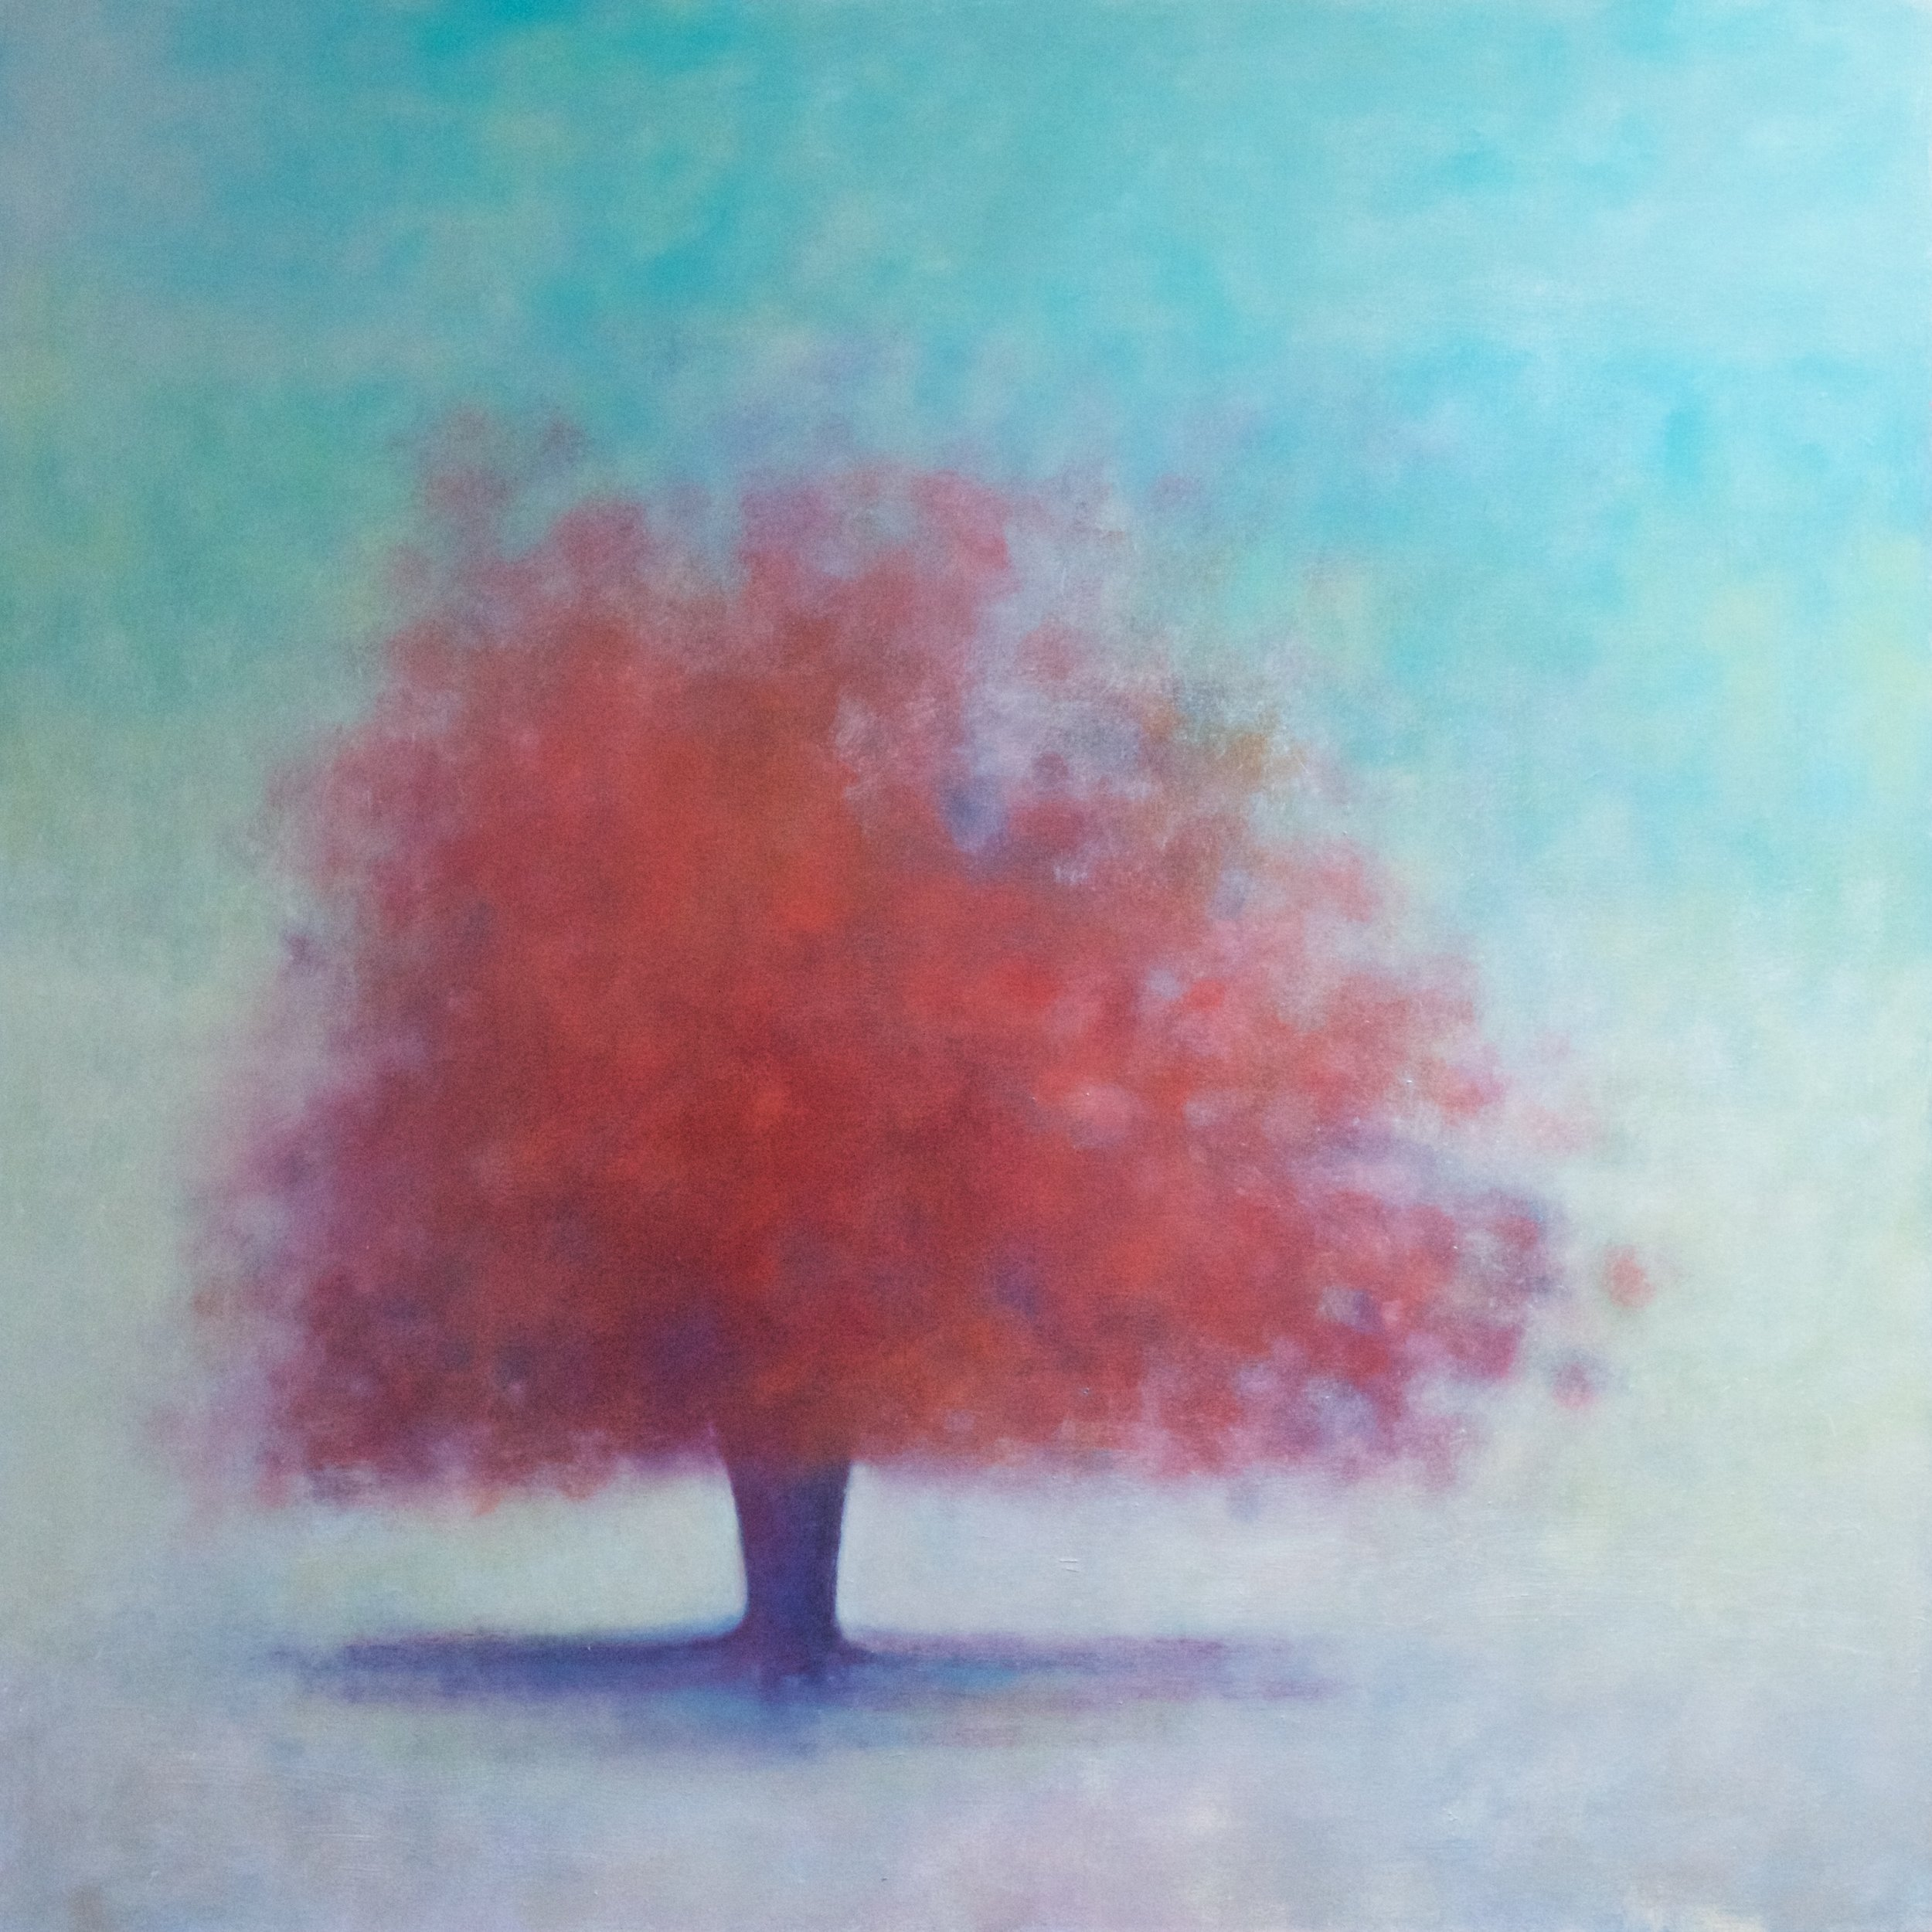 Title: Illumine  Size: 92 x 92 cm  Medium: Oil on canvas  Price: SOLD